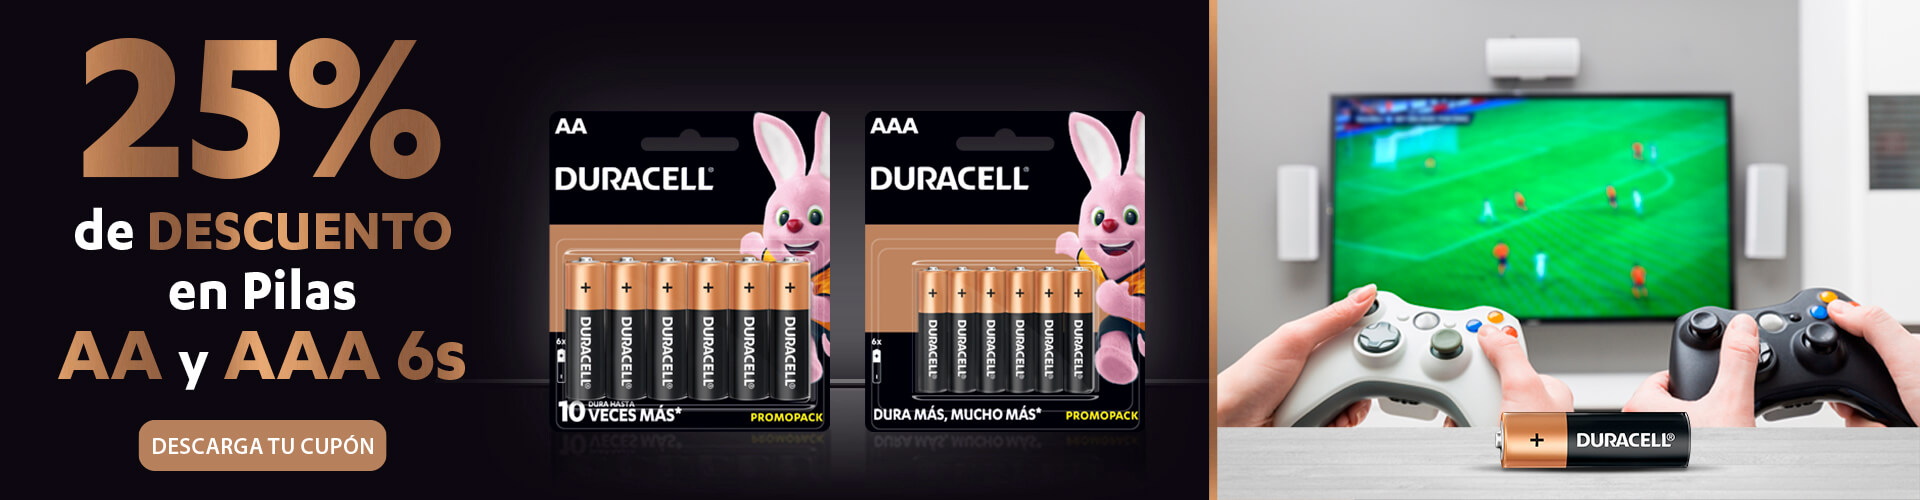 OXXO Promociones Pilas Duracell P6 2021